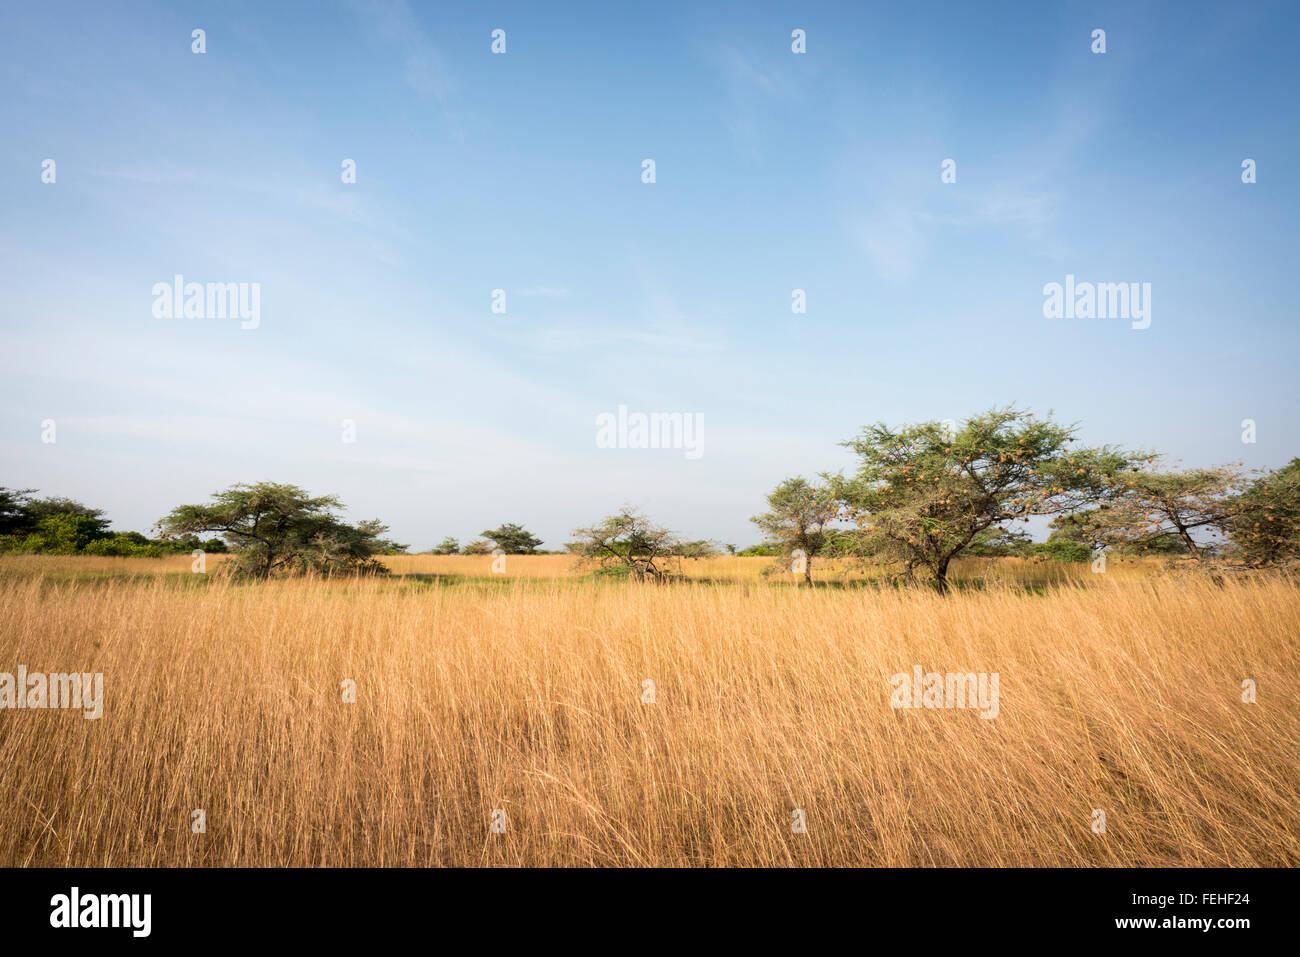 The savannah in Orango in the Bijagos Archipelago of Guinea Bissau - Stock Image